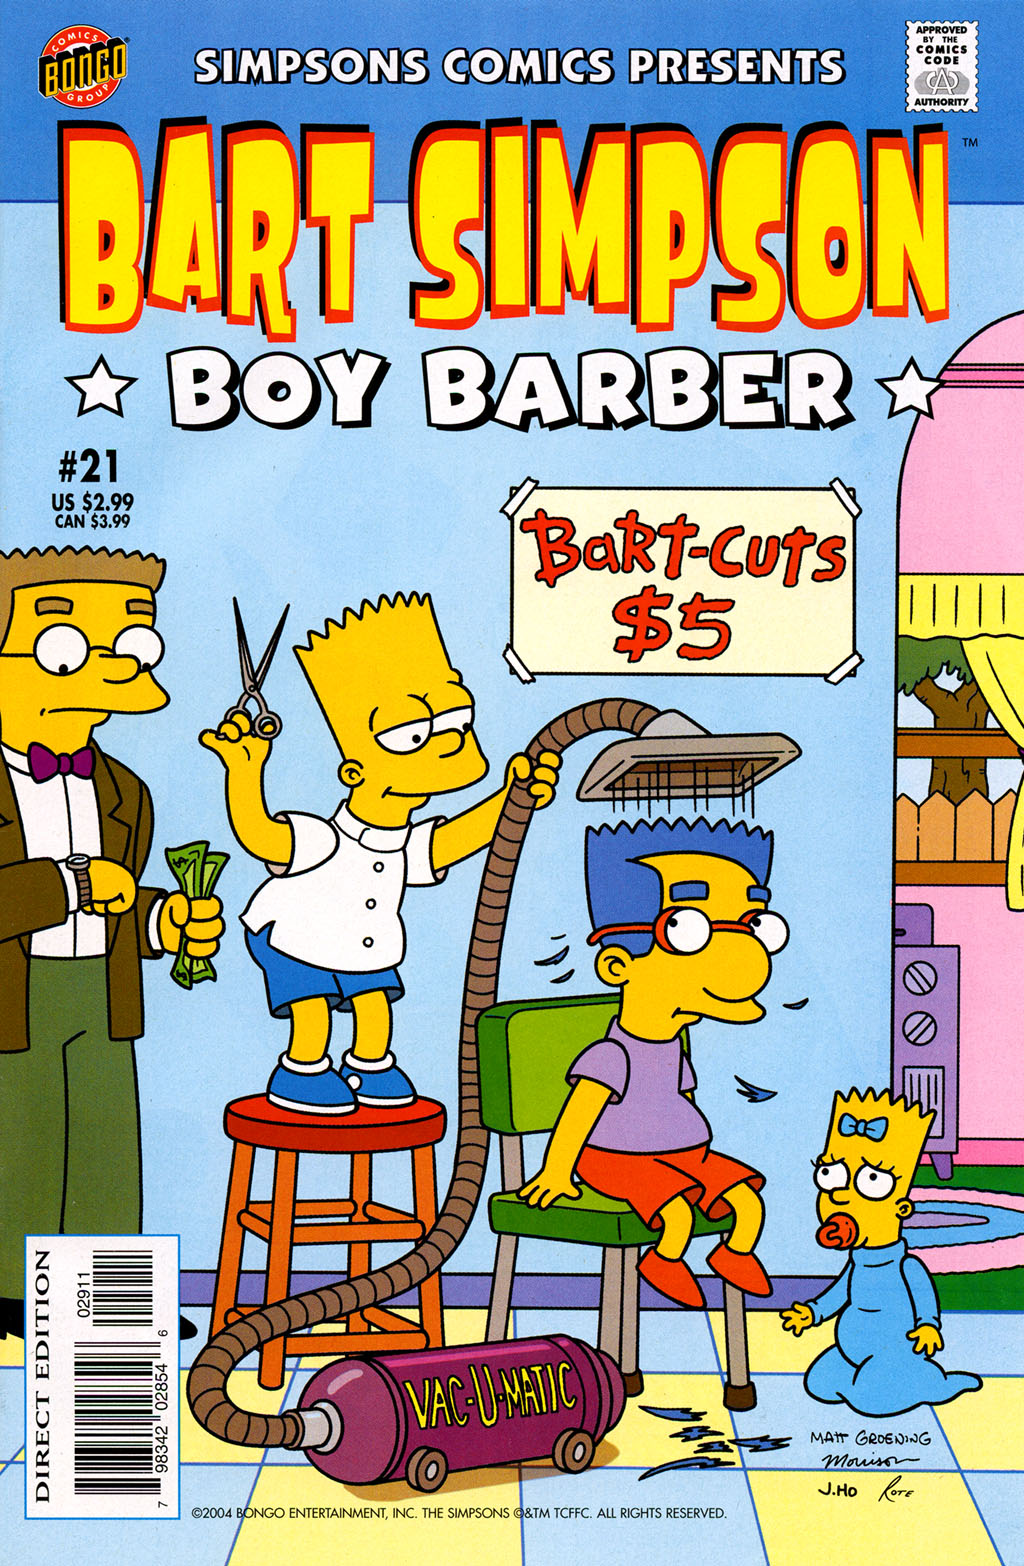 Simpsons Comics Presents Bart Simpson 21 Page 1